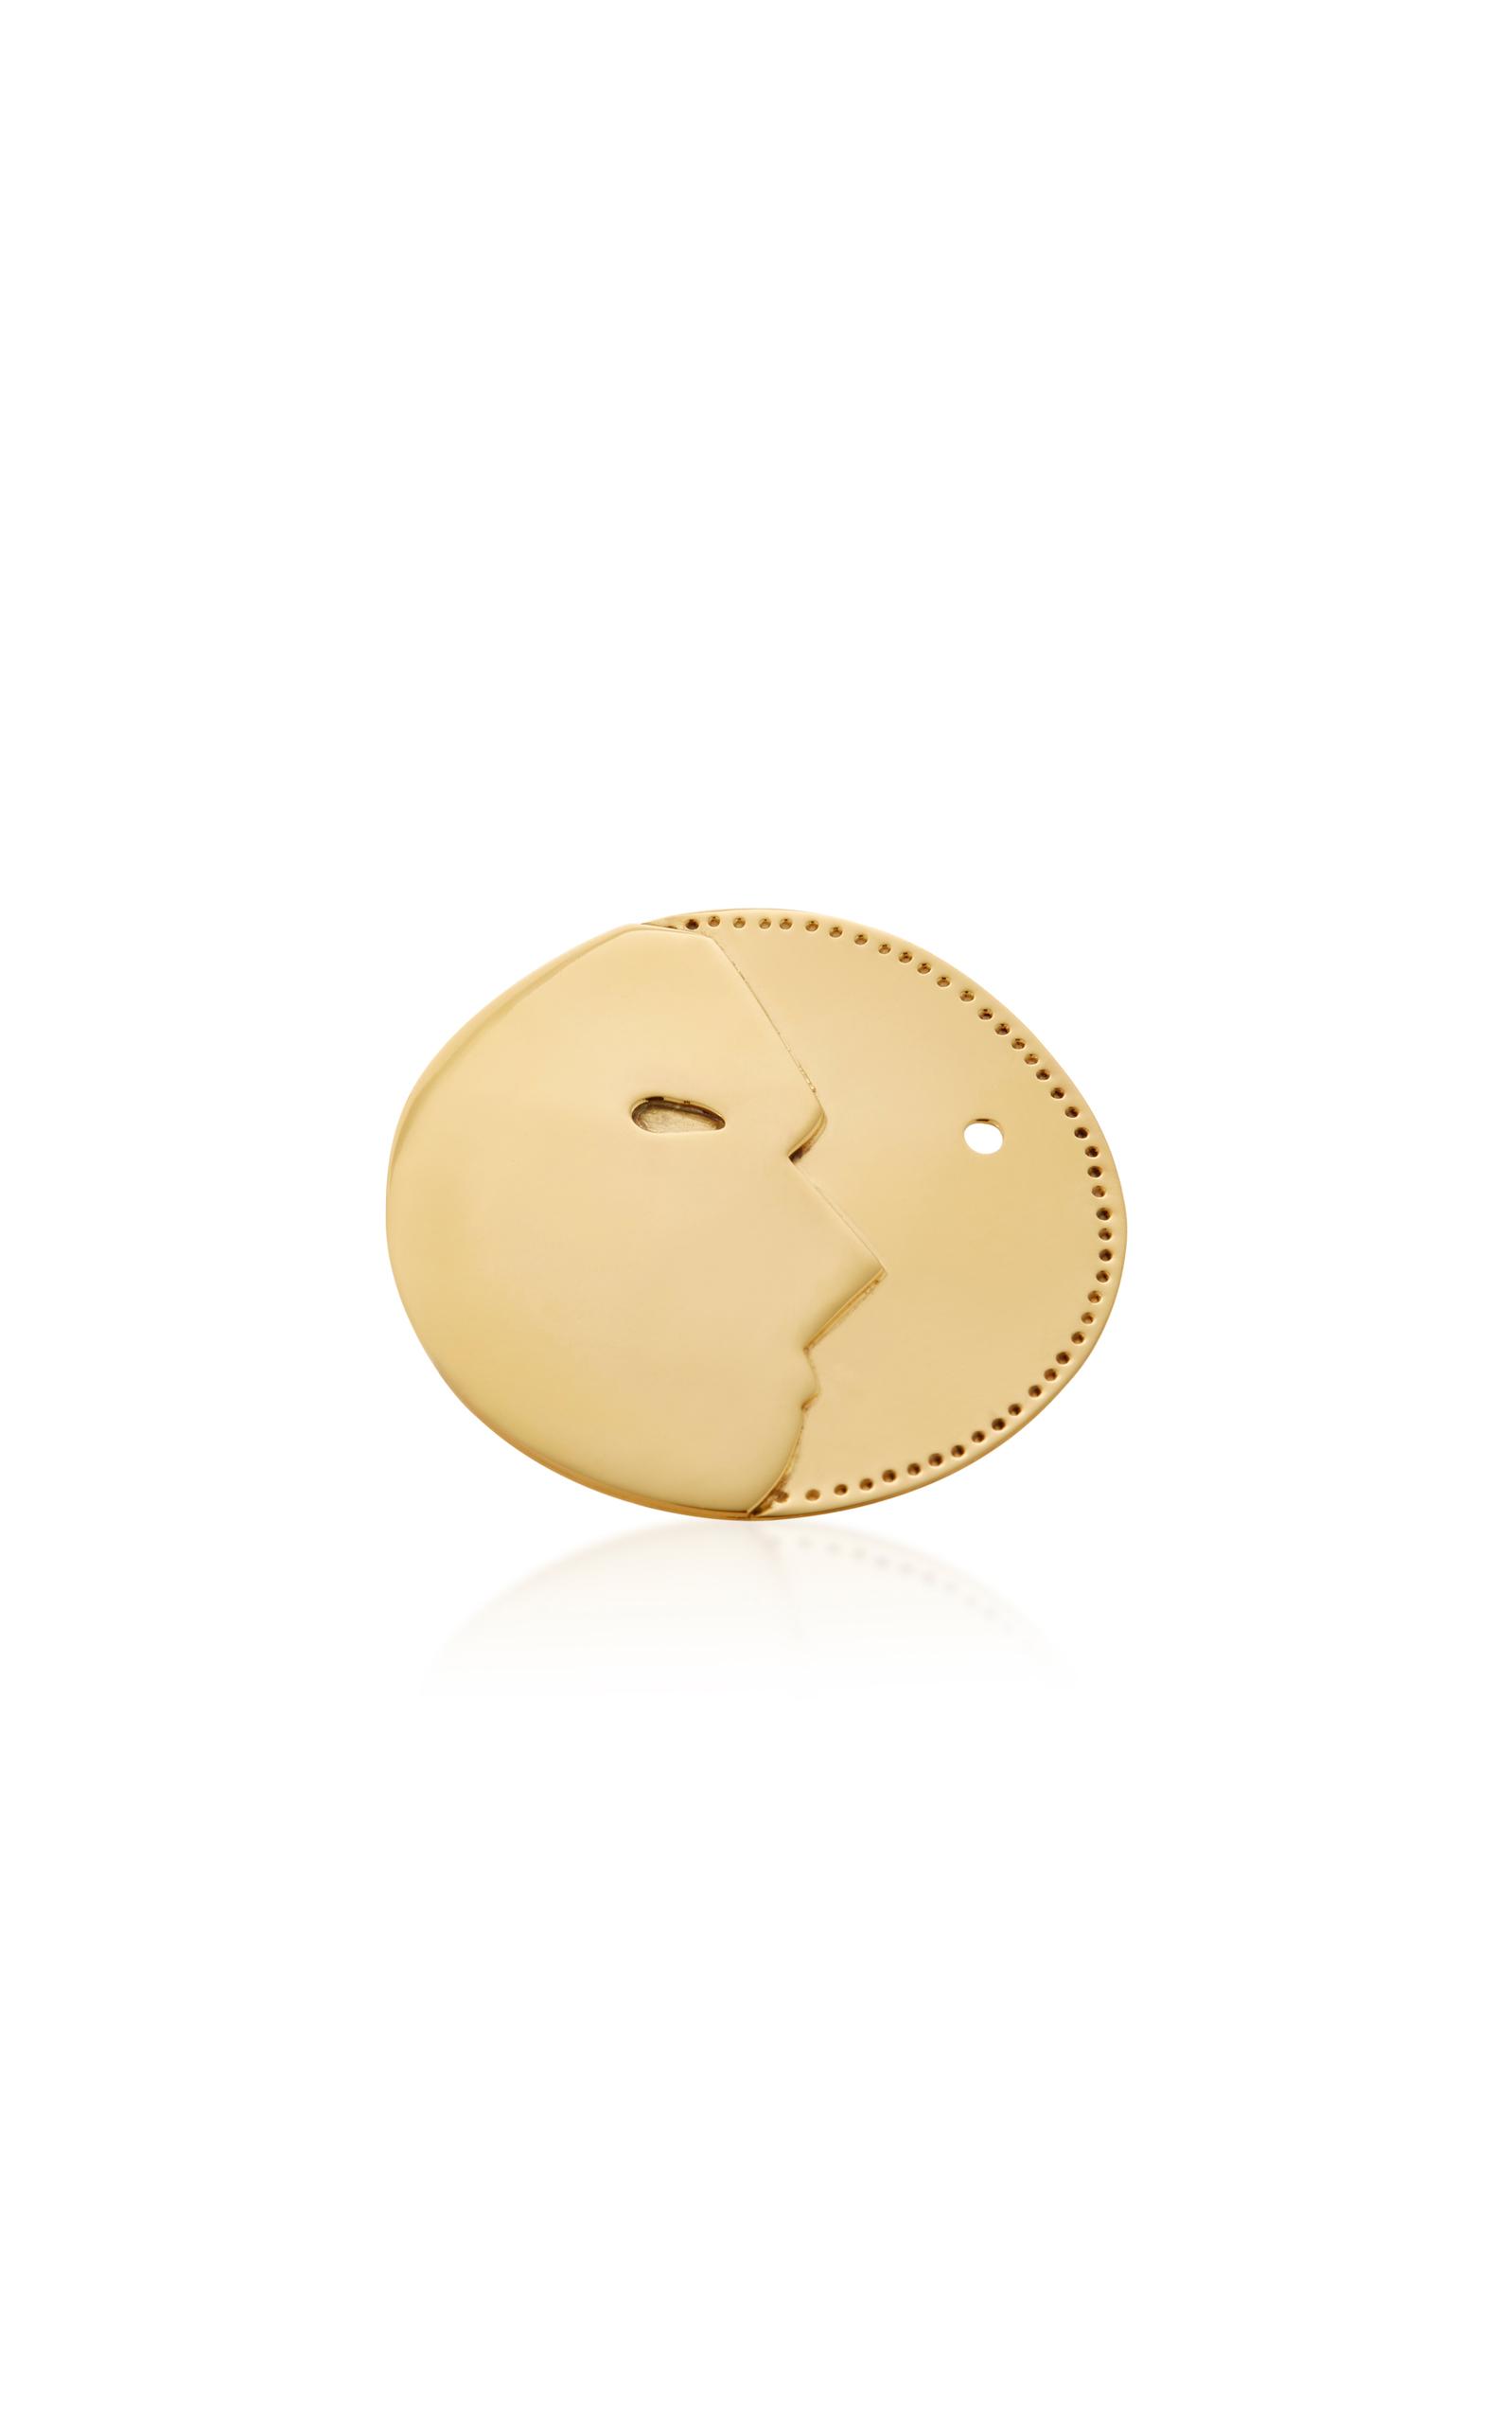 KALMAR MANMOON GOLD-PLATED BRASS RING